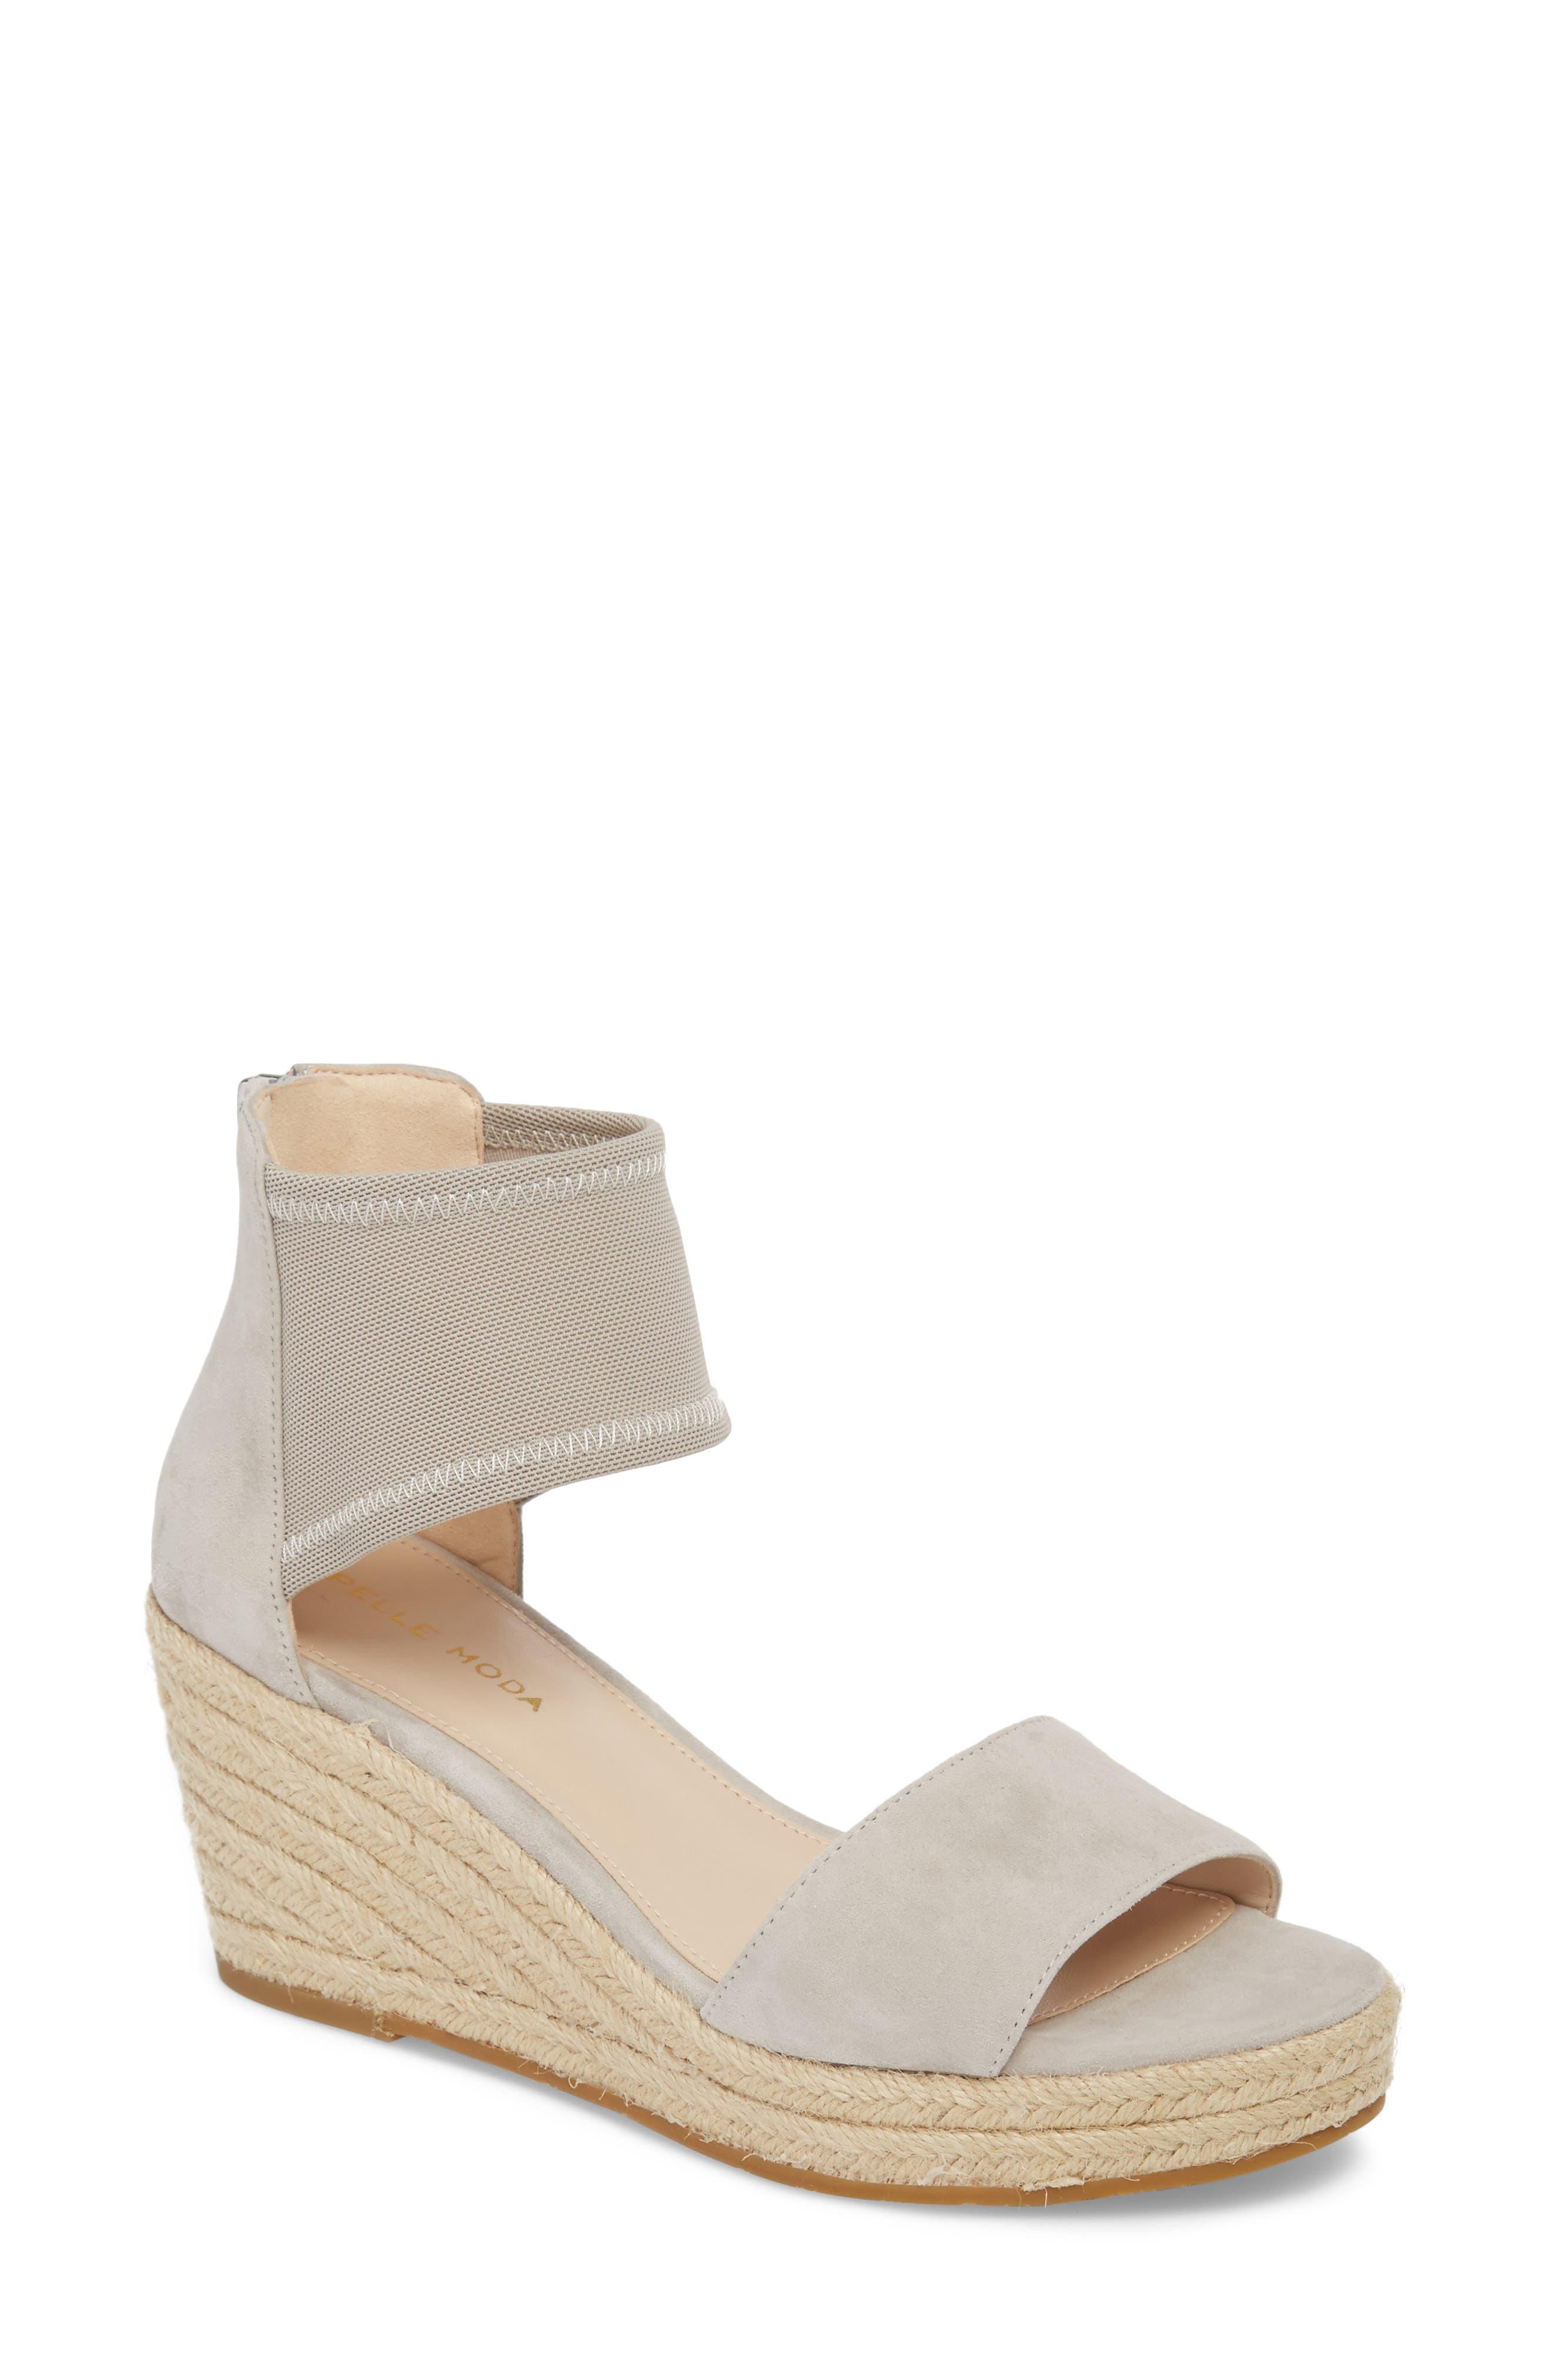 Kona Platform Wedge Sandal,                         Main,                         color, CLOUD SUEDE